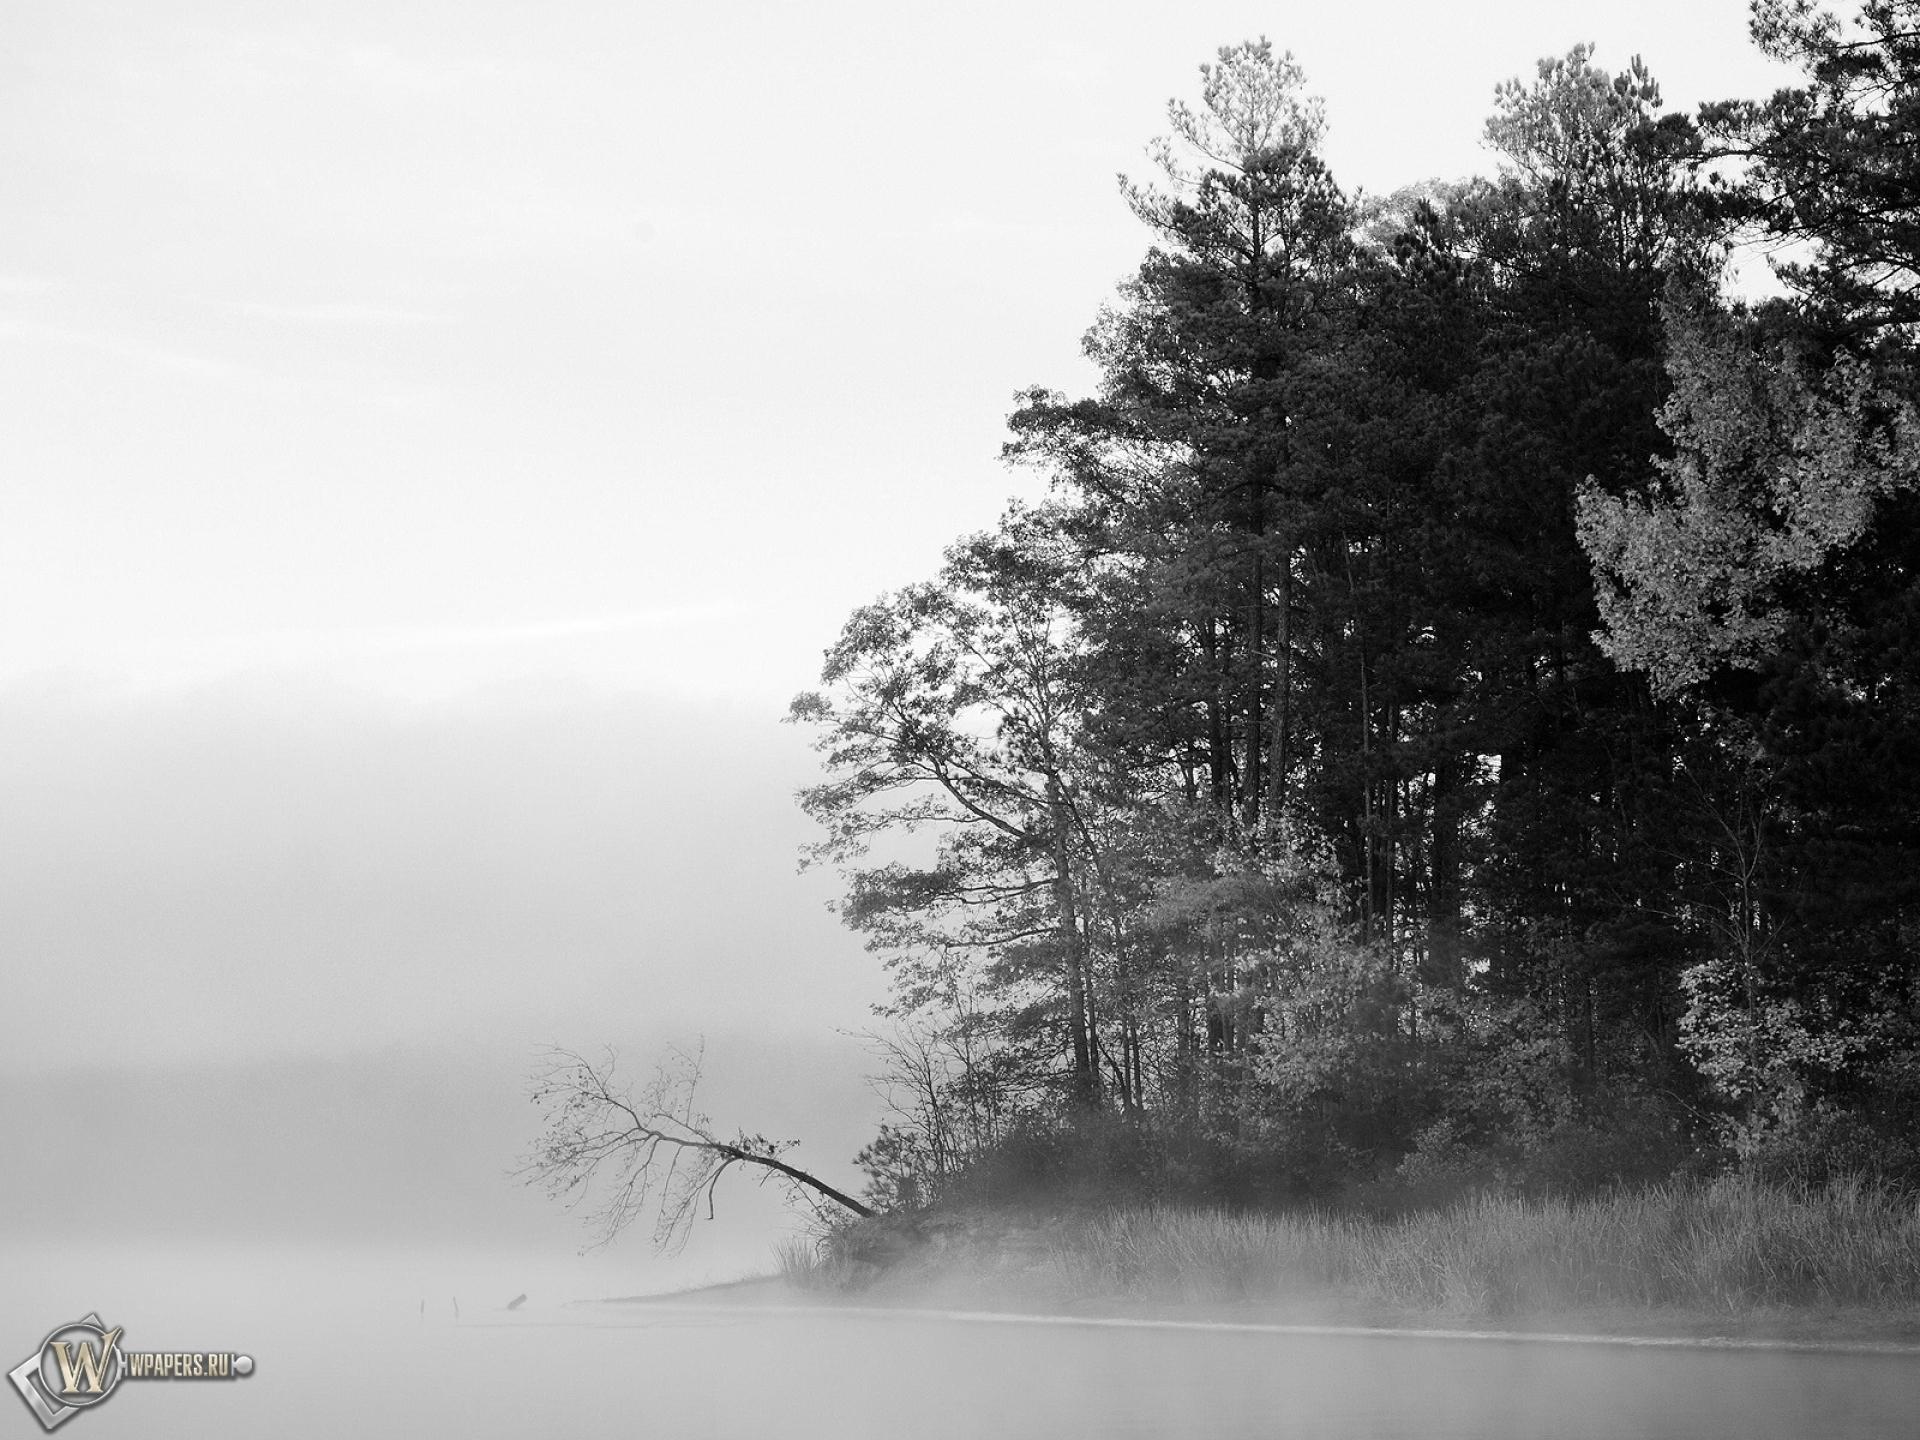 стол лес на рабочий фото туманный